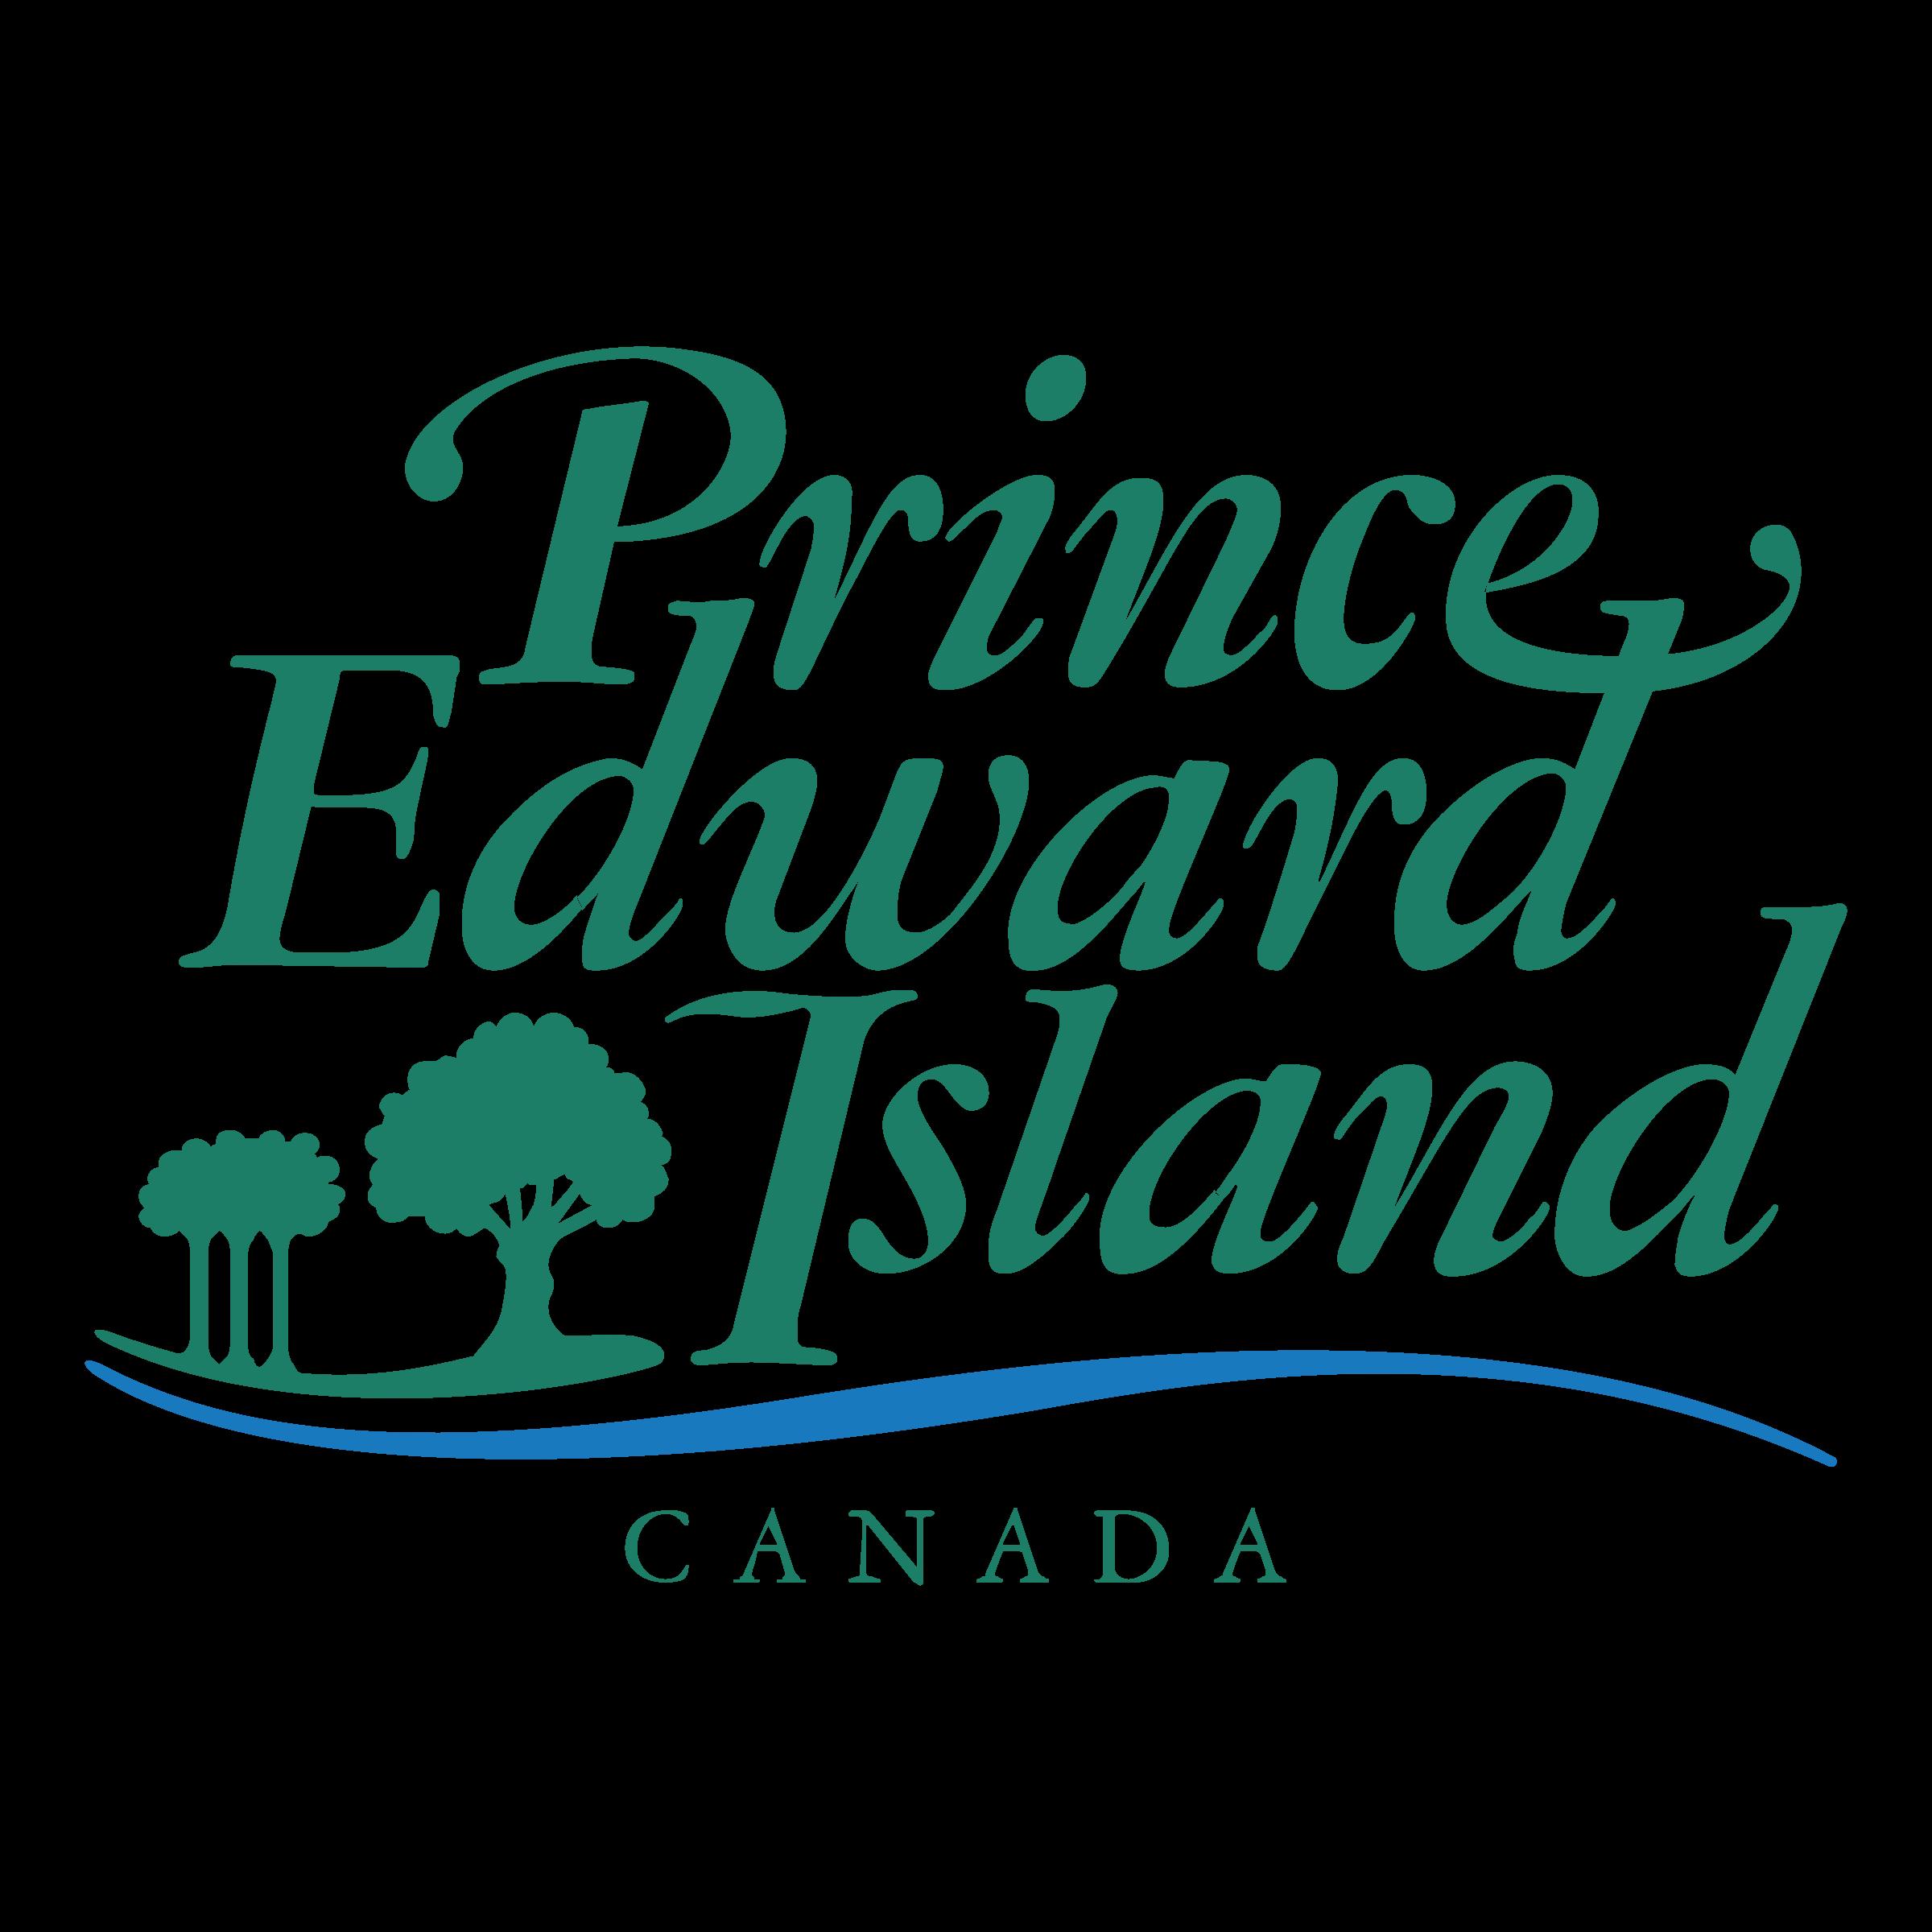 prince-edward-island-logo-png-transparent.png